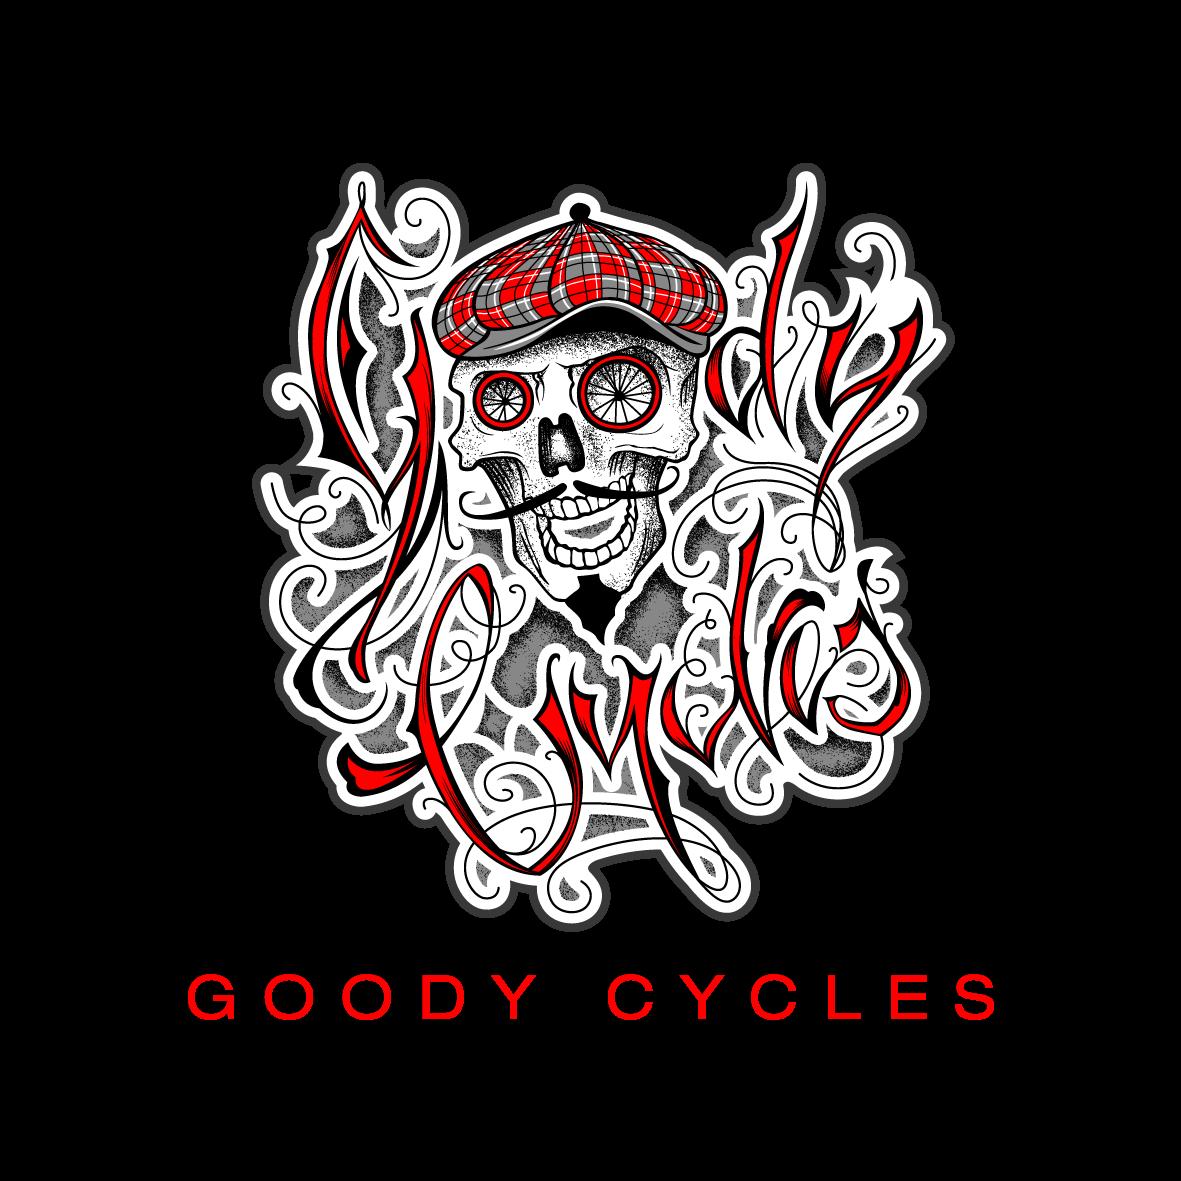 GOODYCycles